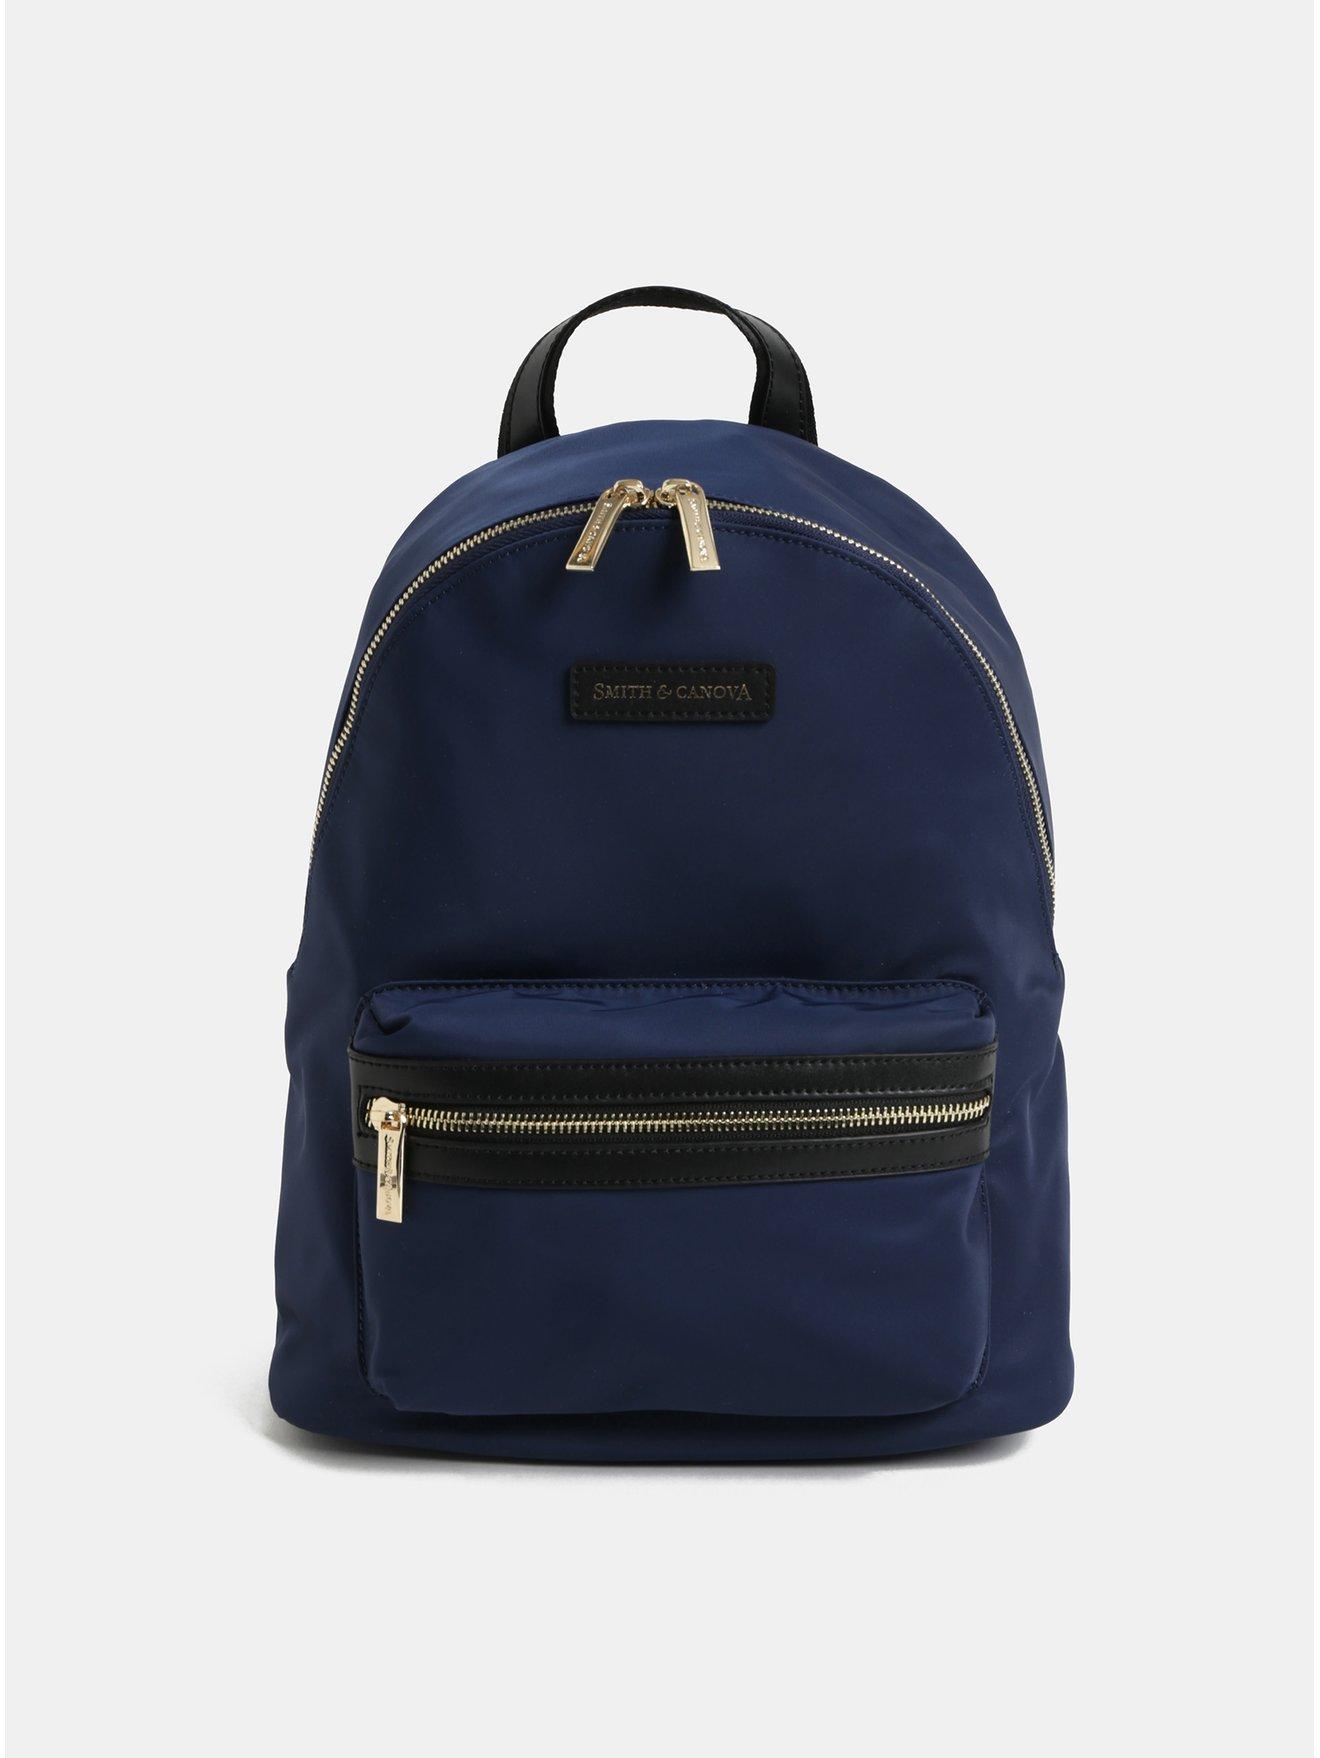 Modrý batoh Smith   Canova da81a58a0d